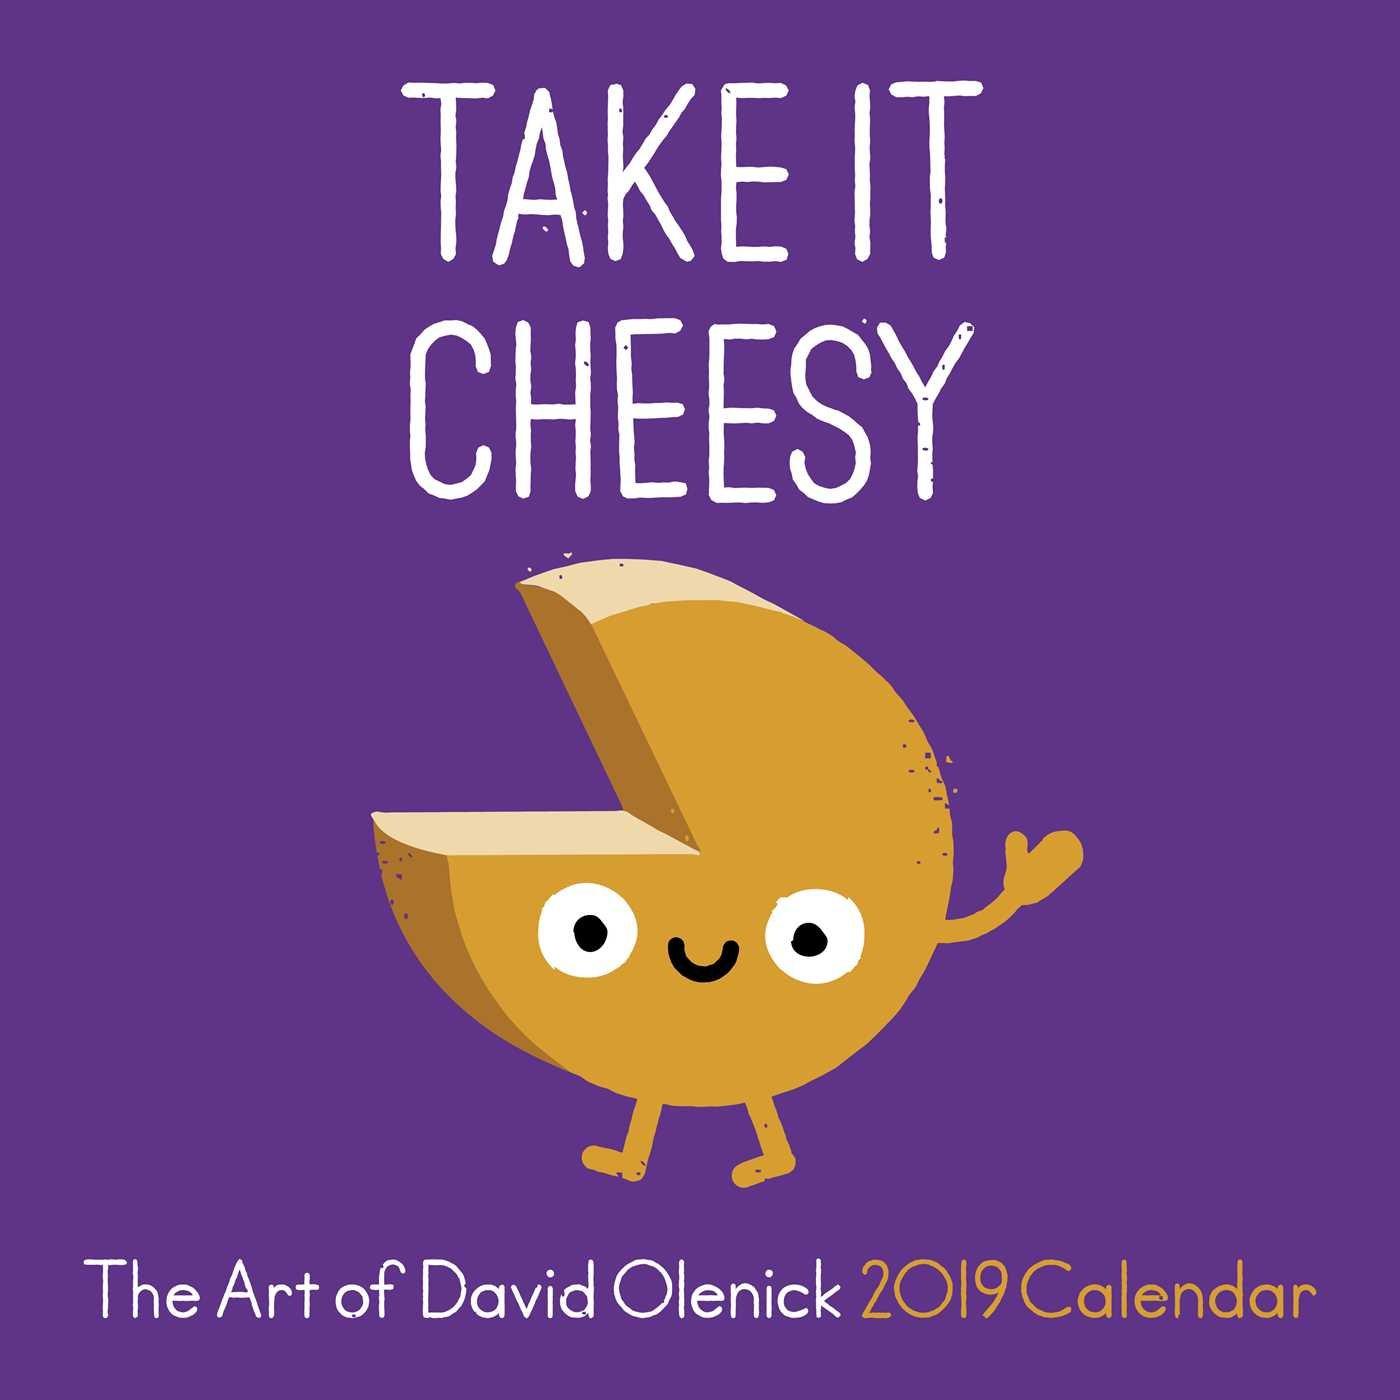 December 2019 Nyc Art Calendar The Art of David Olenick 2019 Wall Calendar: Take It Cheesy: David